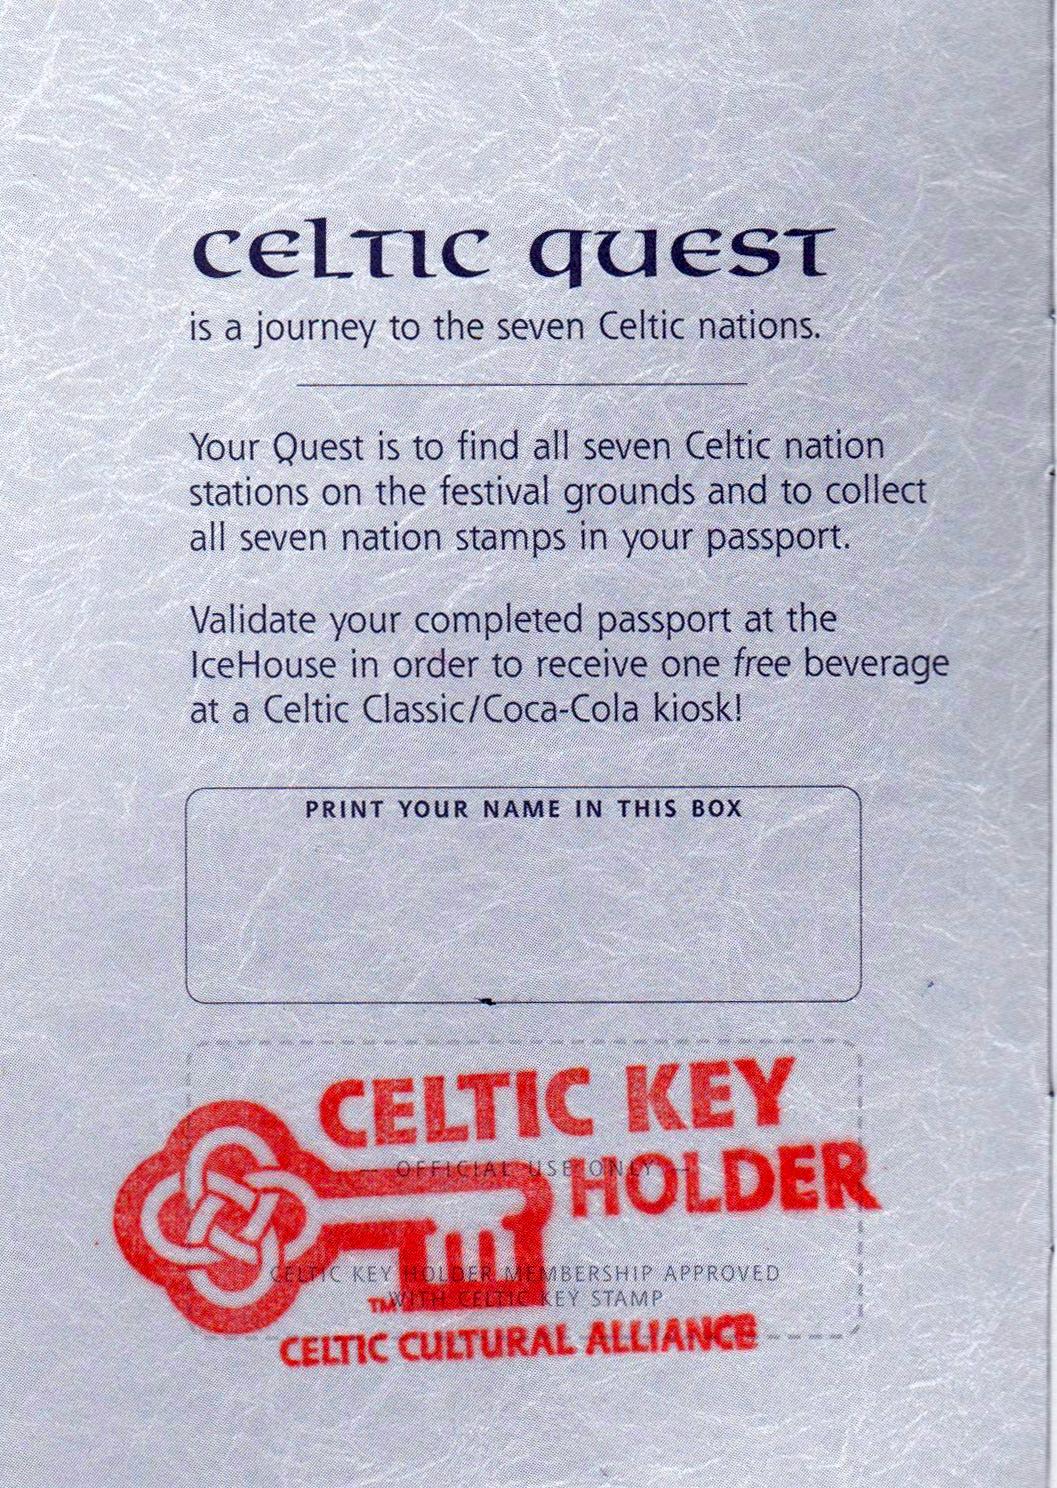 KM_CelticQ_InsideFrontCover.jpg